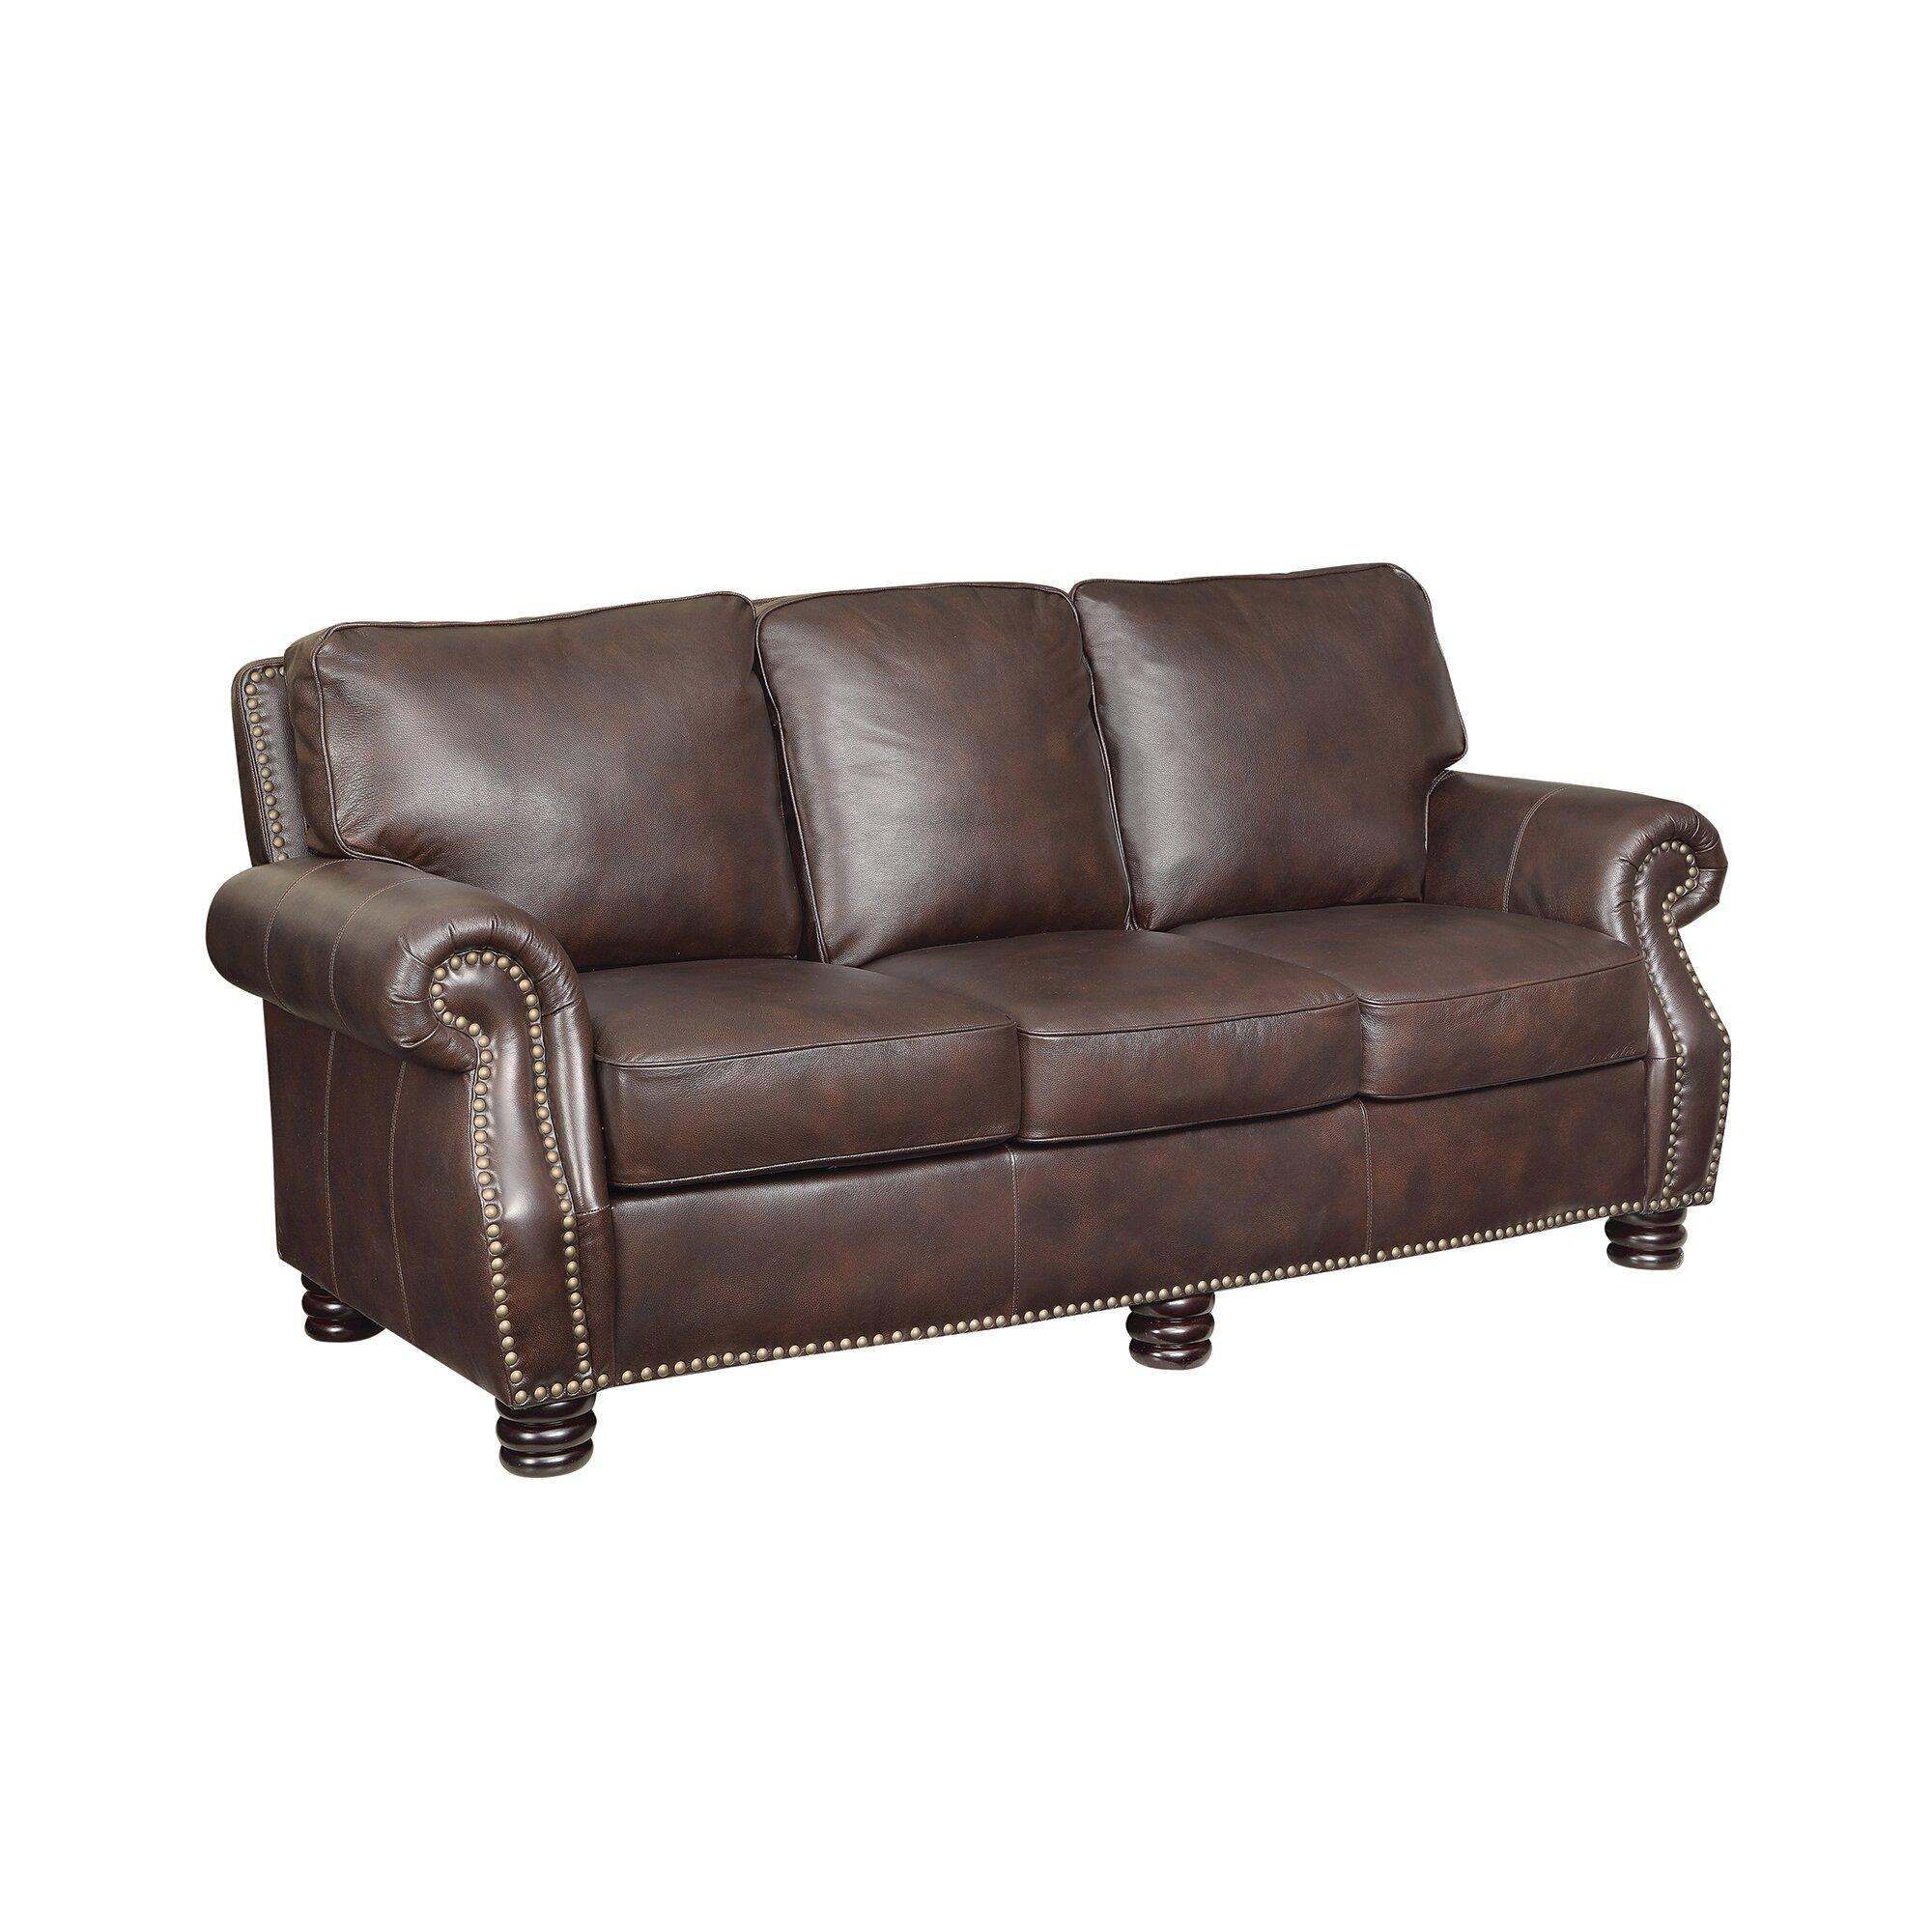 Wildon Home Briscoe Leather Modular Sofa Wayfair